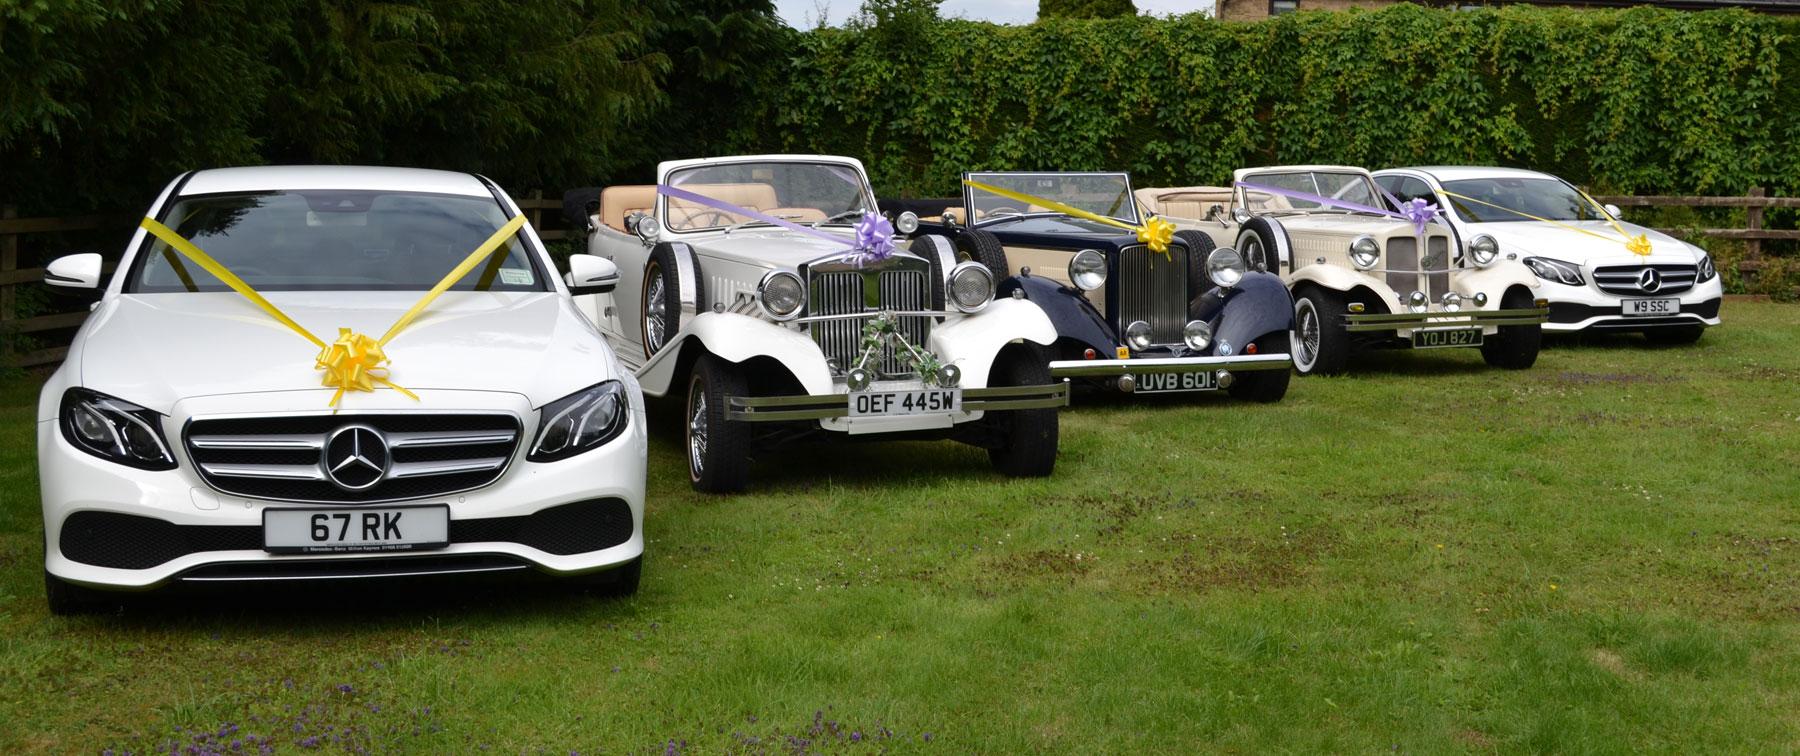 Champaneri Cars Leicestershire